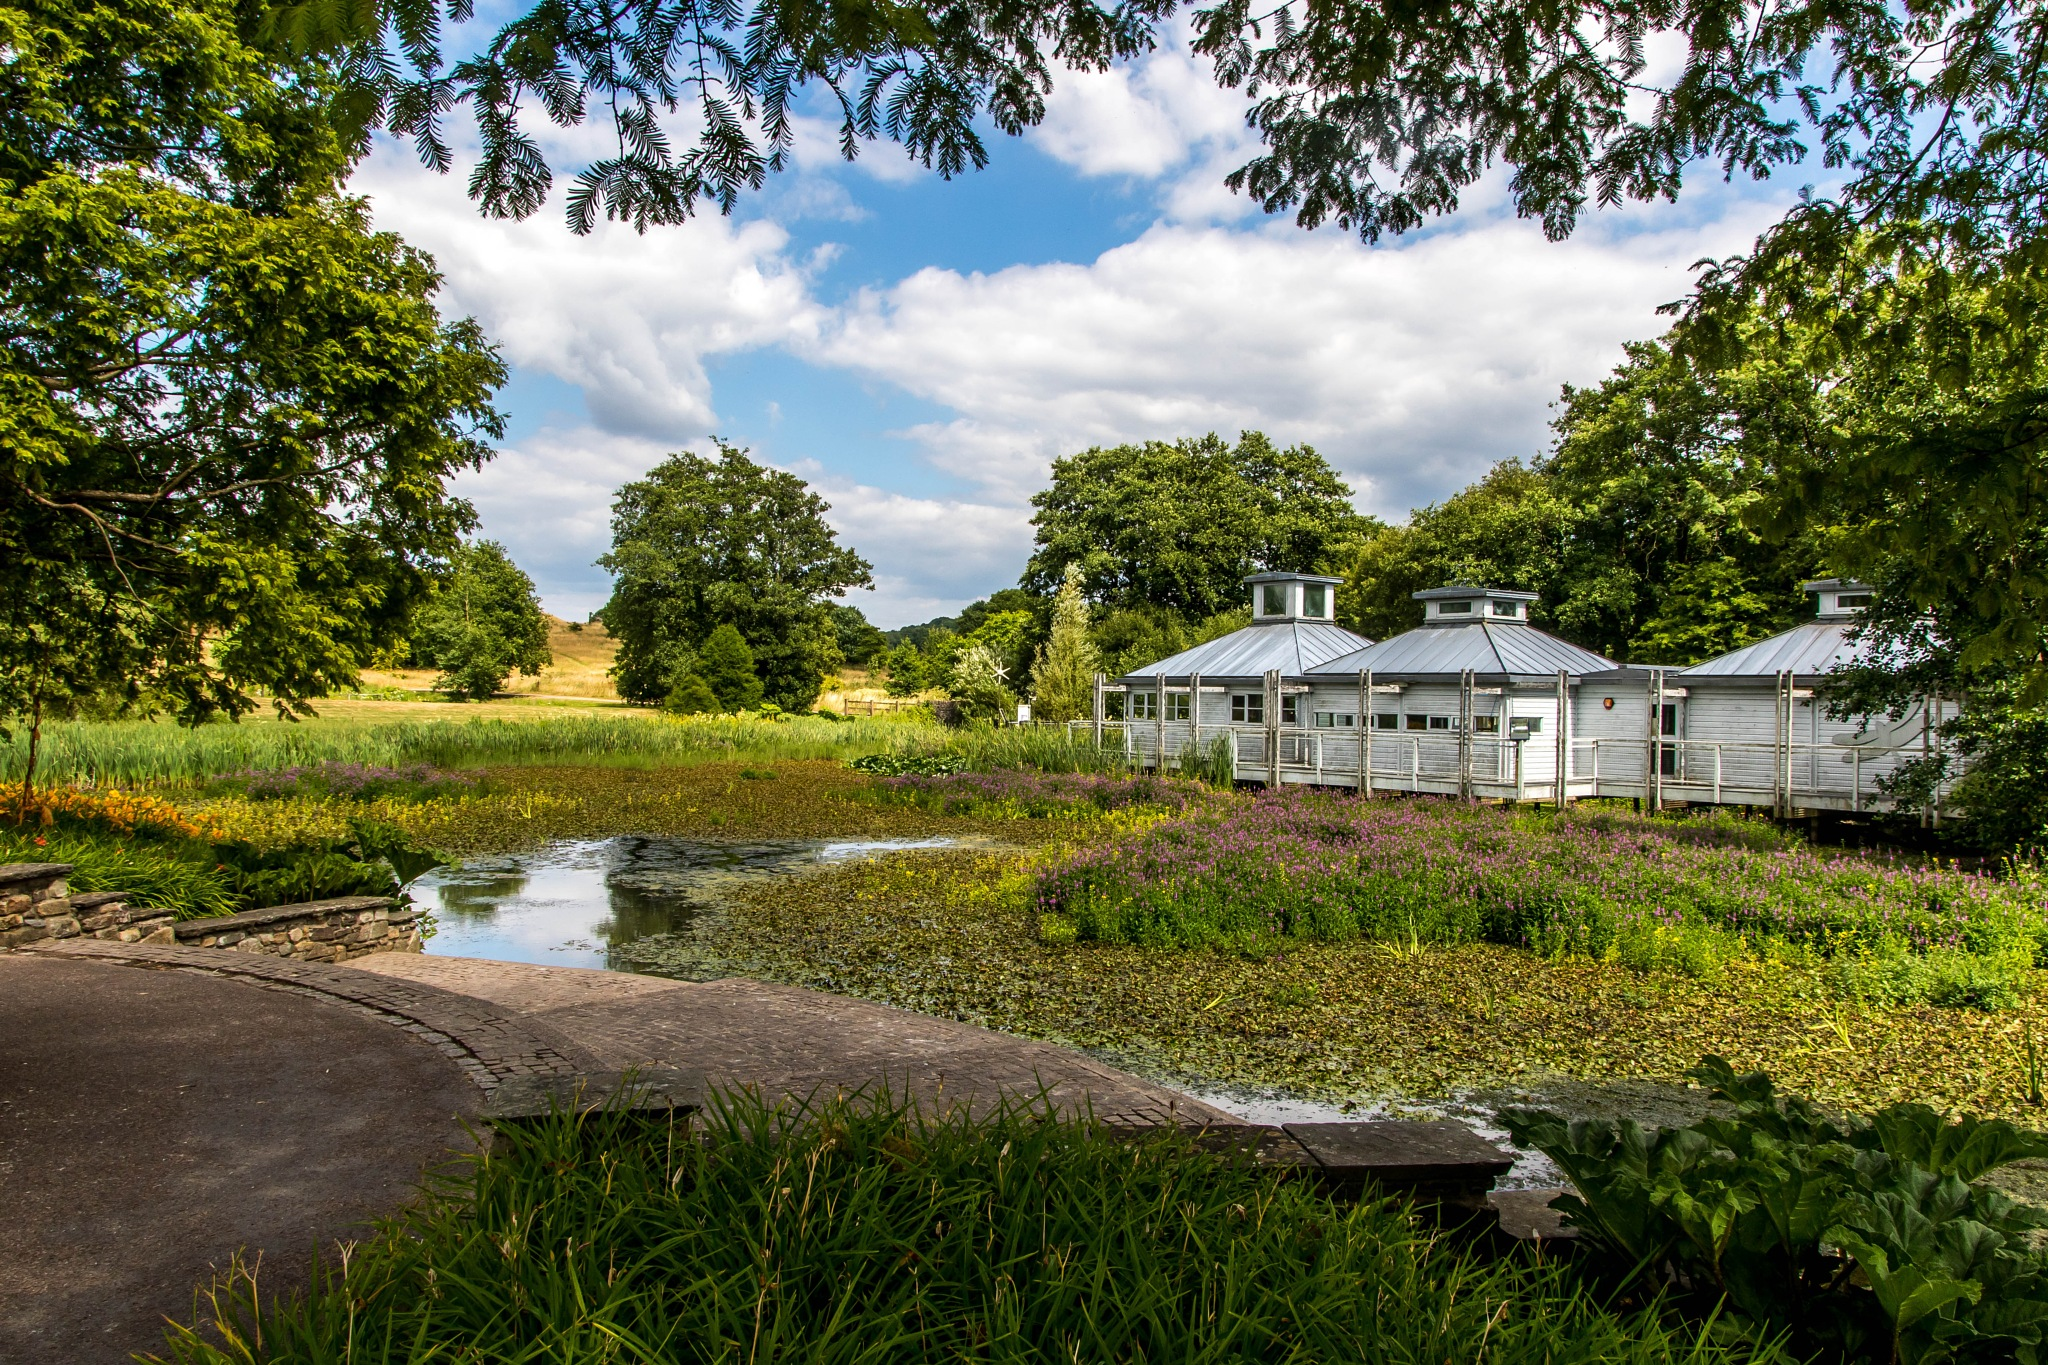 National Botanical Gardens of Wales by John Davies